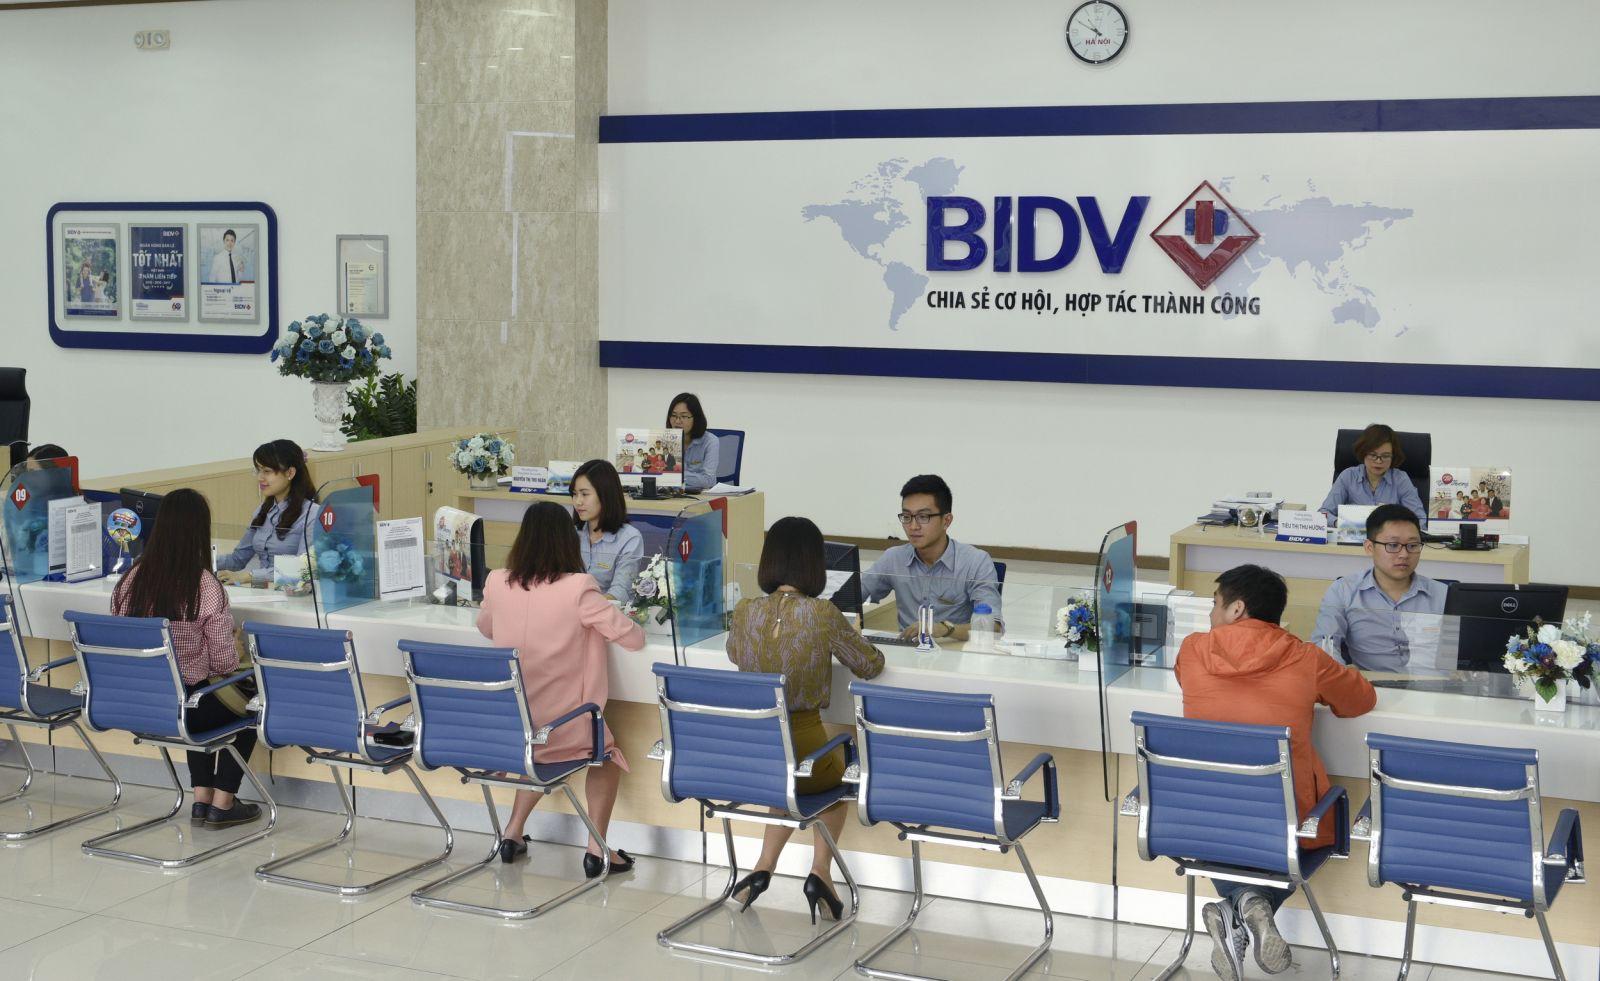 Vietnam arrests former BIDV banker amid graft crackdown